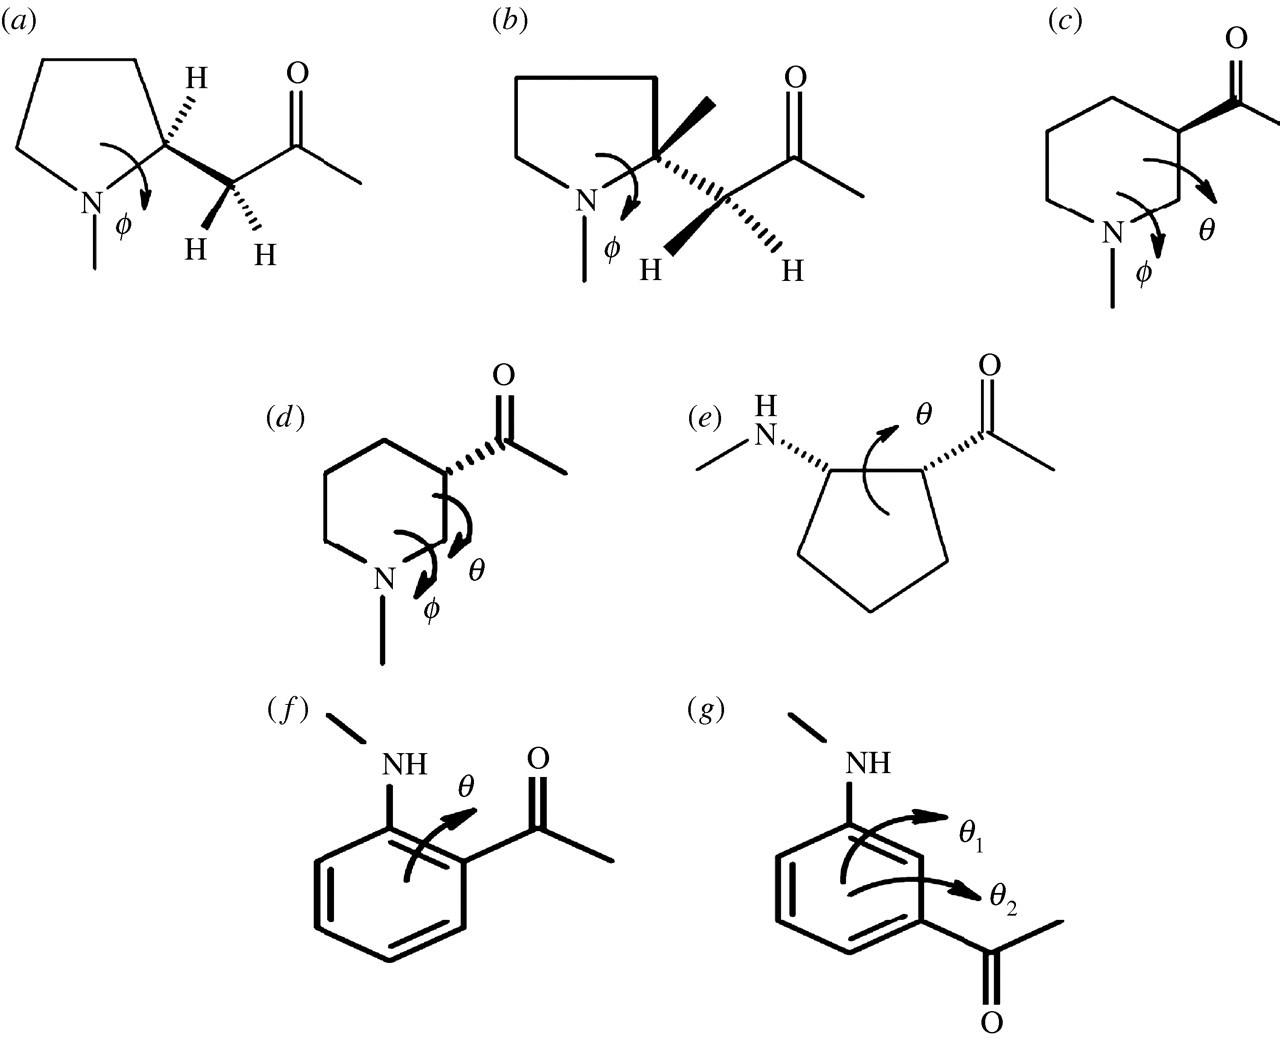 Expanding the polypeptide backbone: hydrogen-bonded